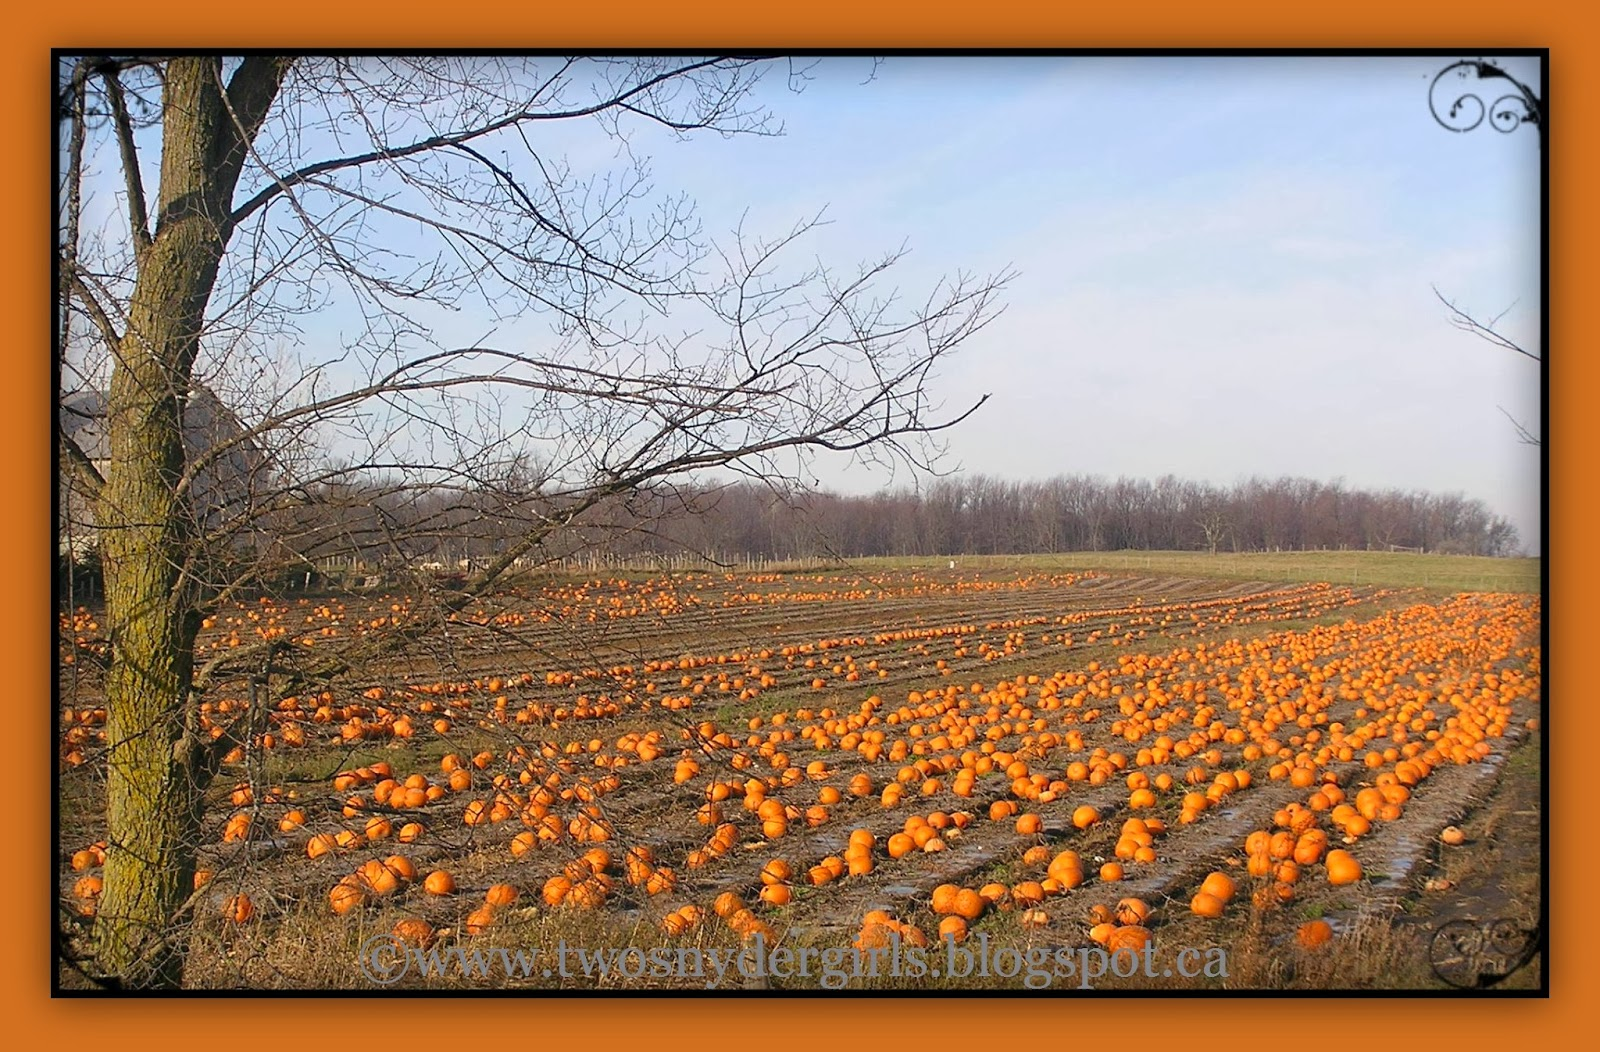 Pumpkins in fall field